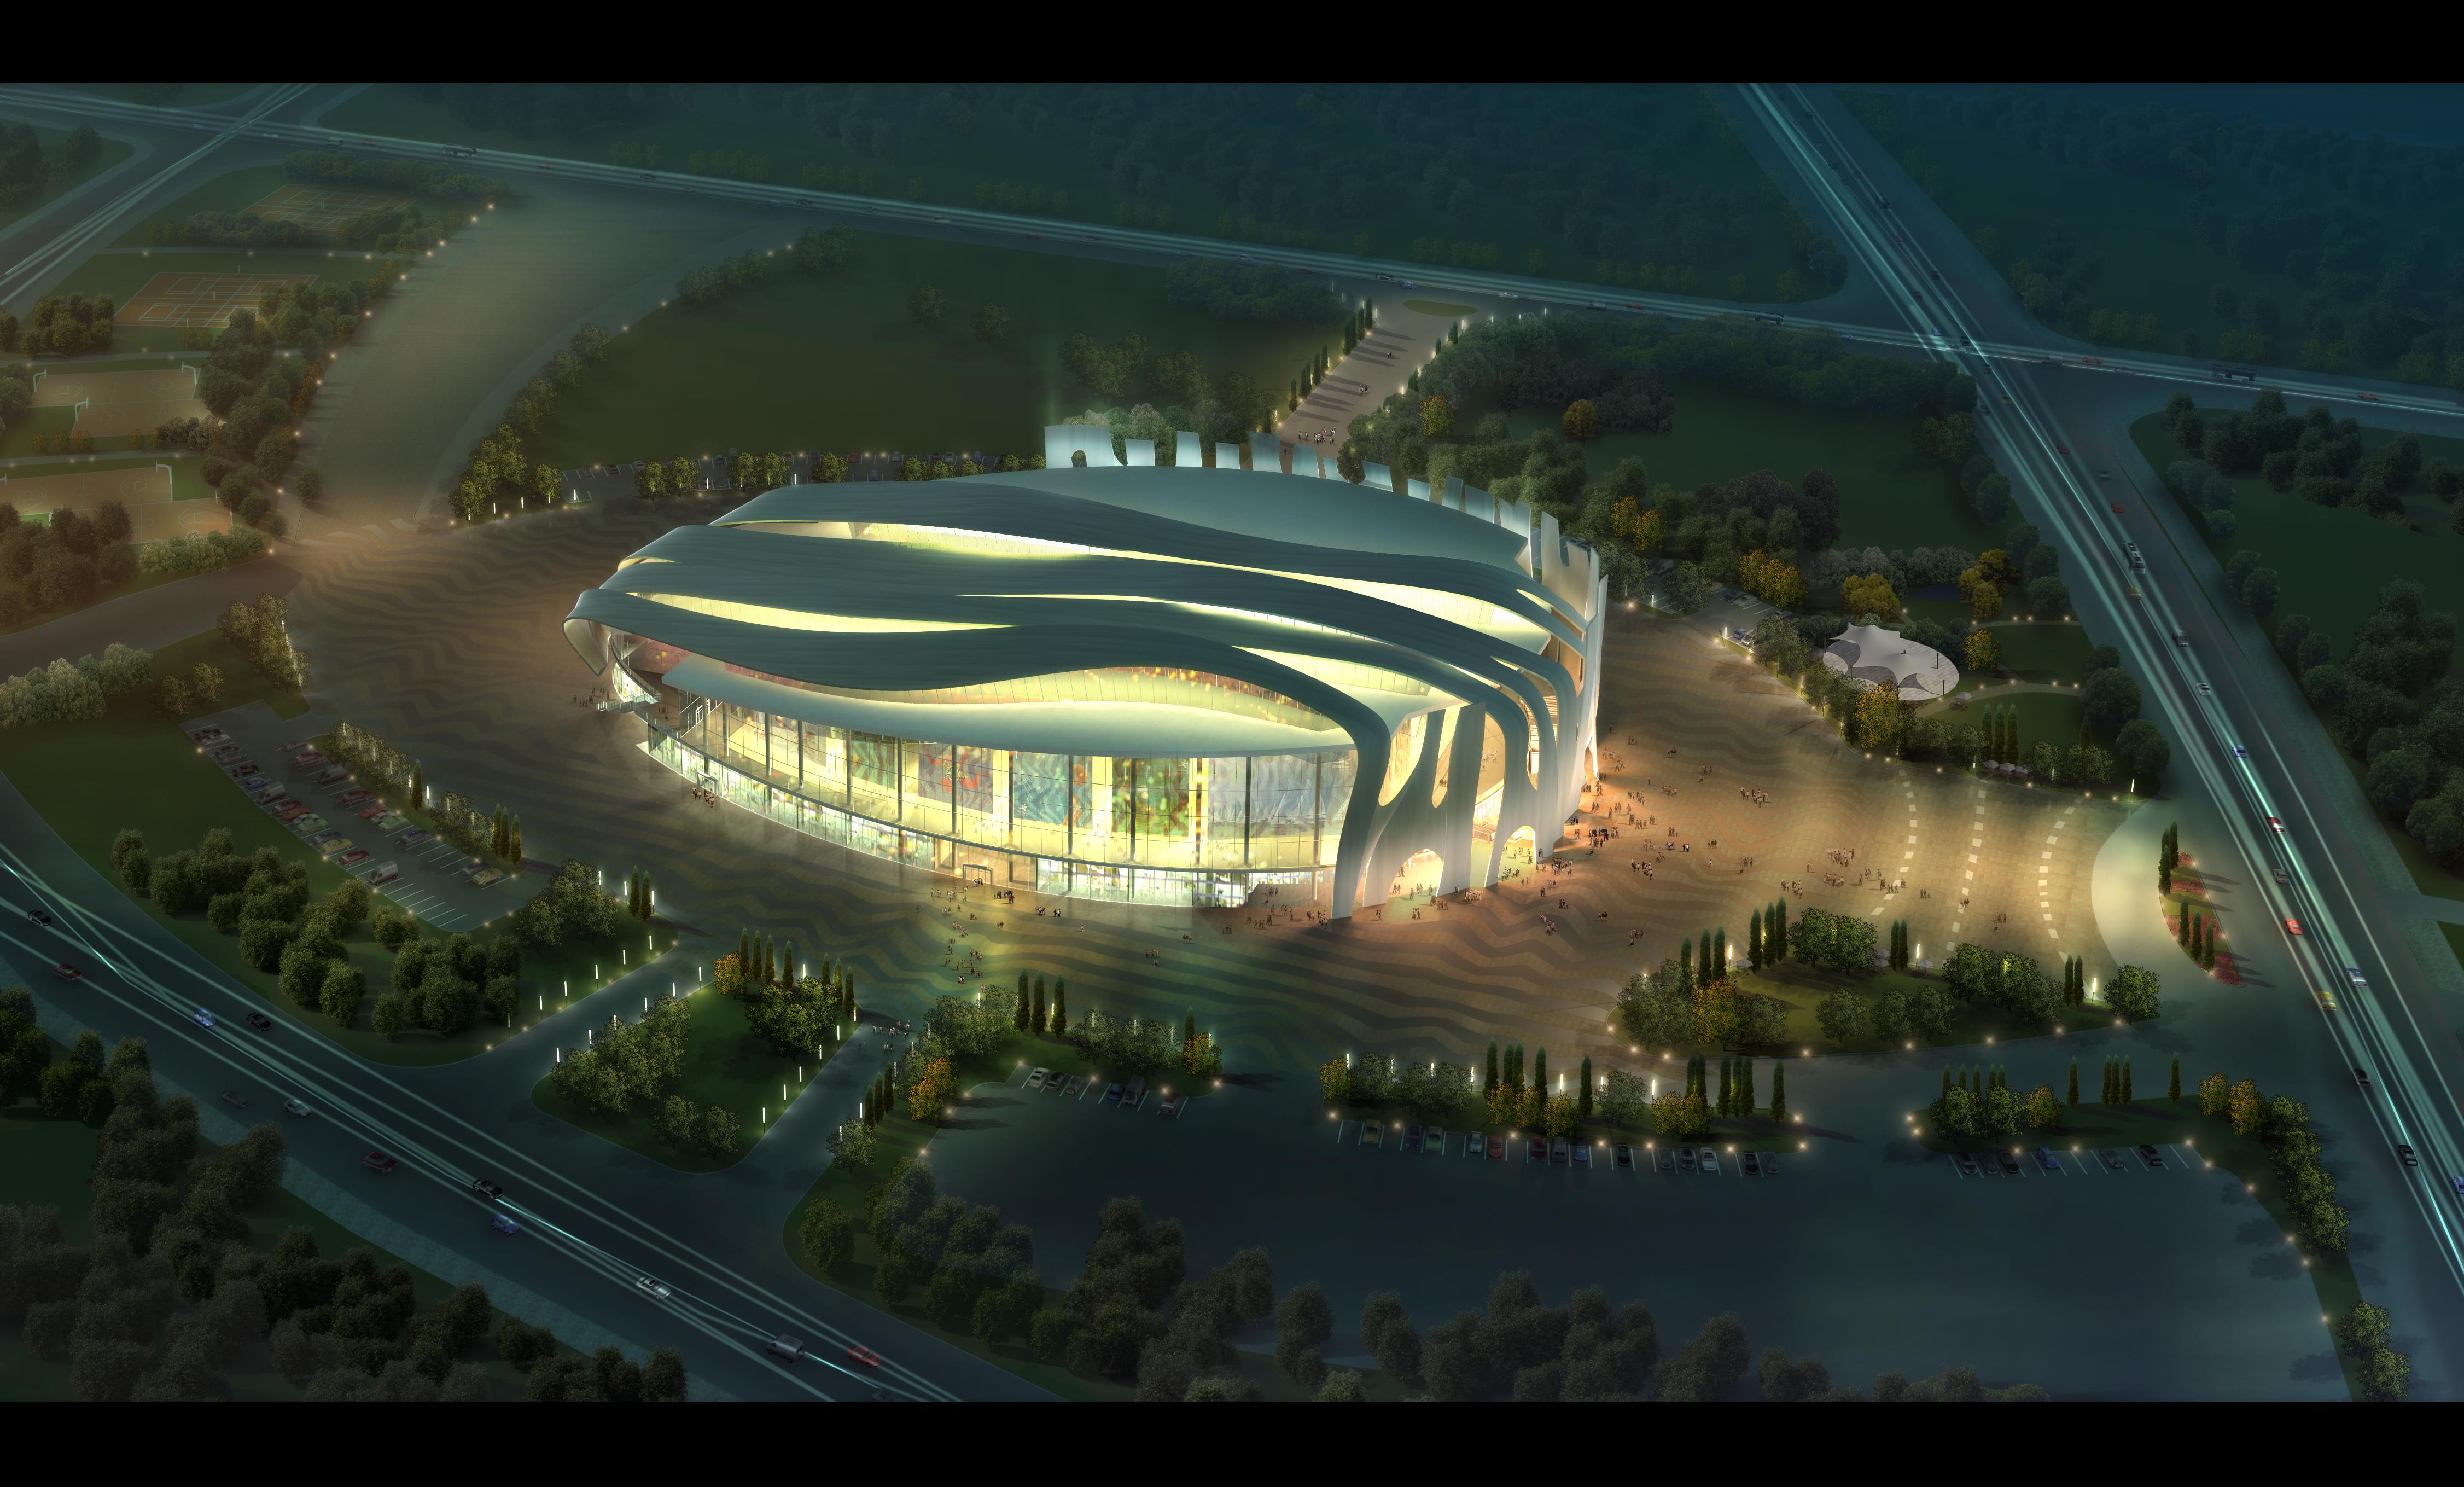 grand stadium 010 3d model 3ds psd obj 98214